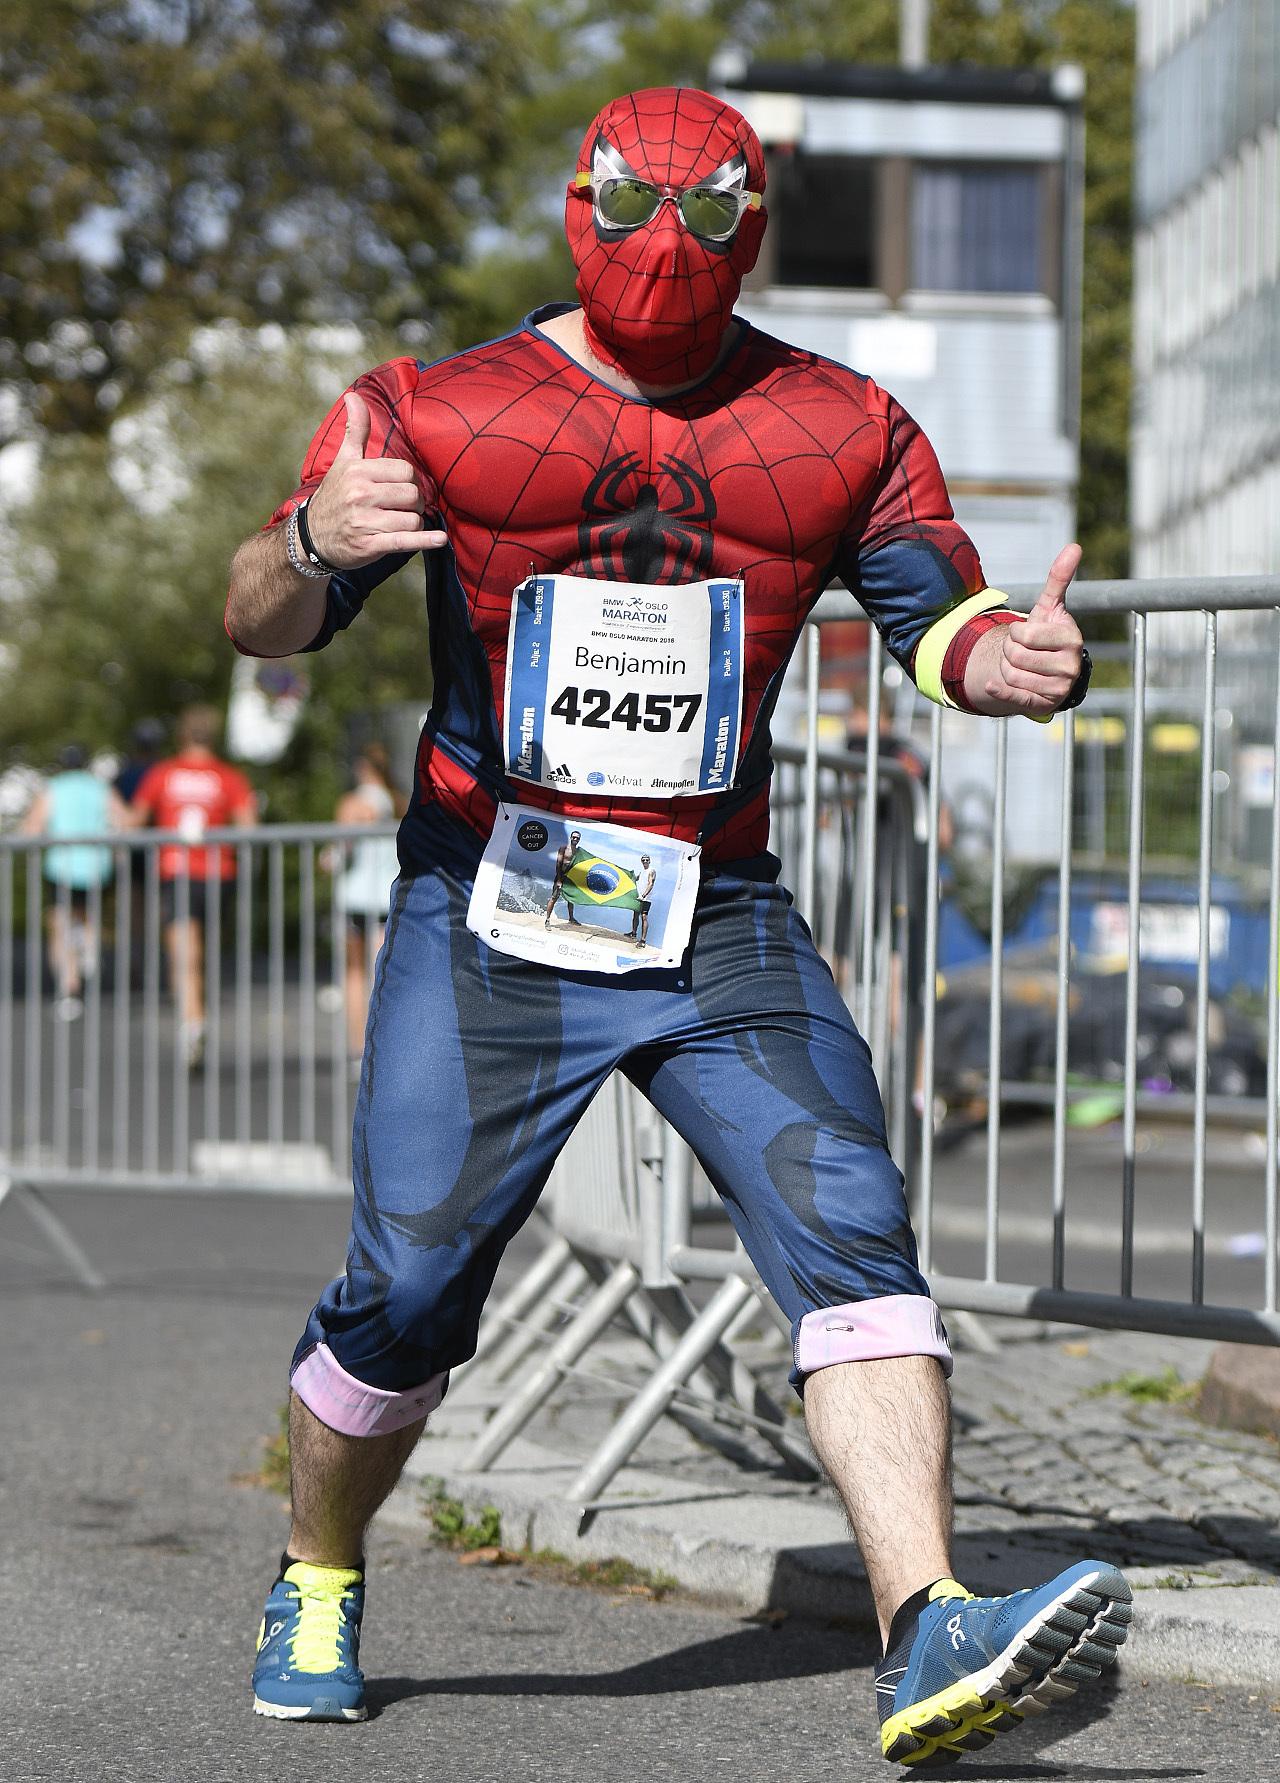 spiderman_50D2586.jpg